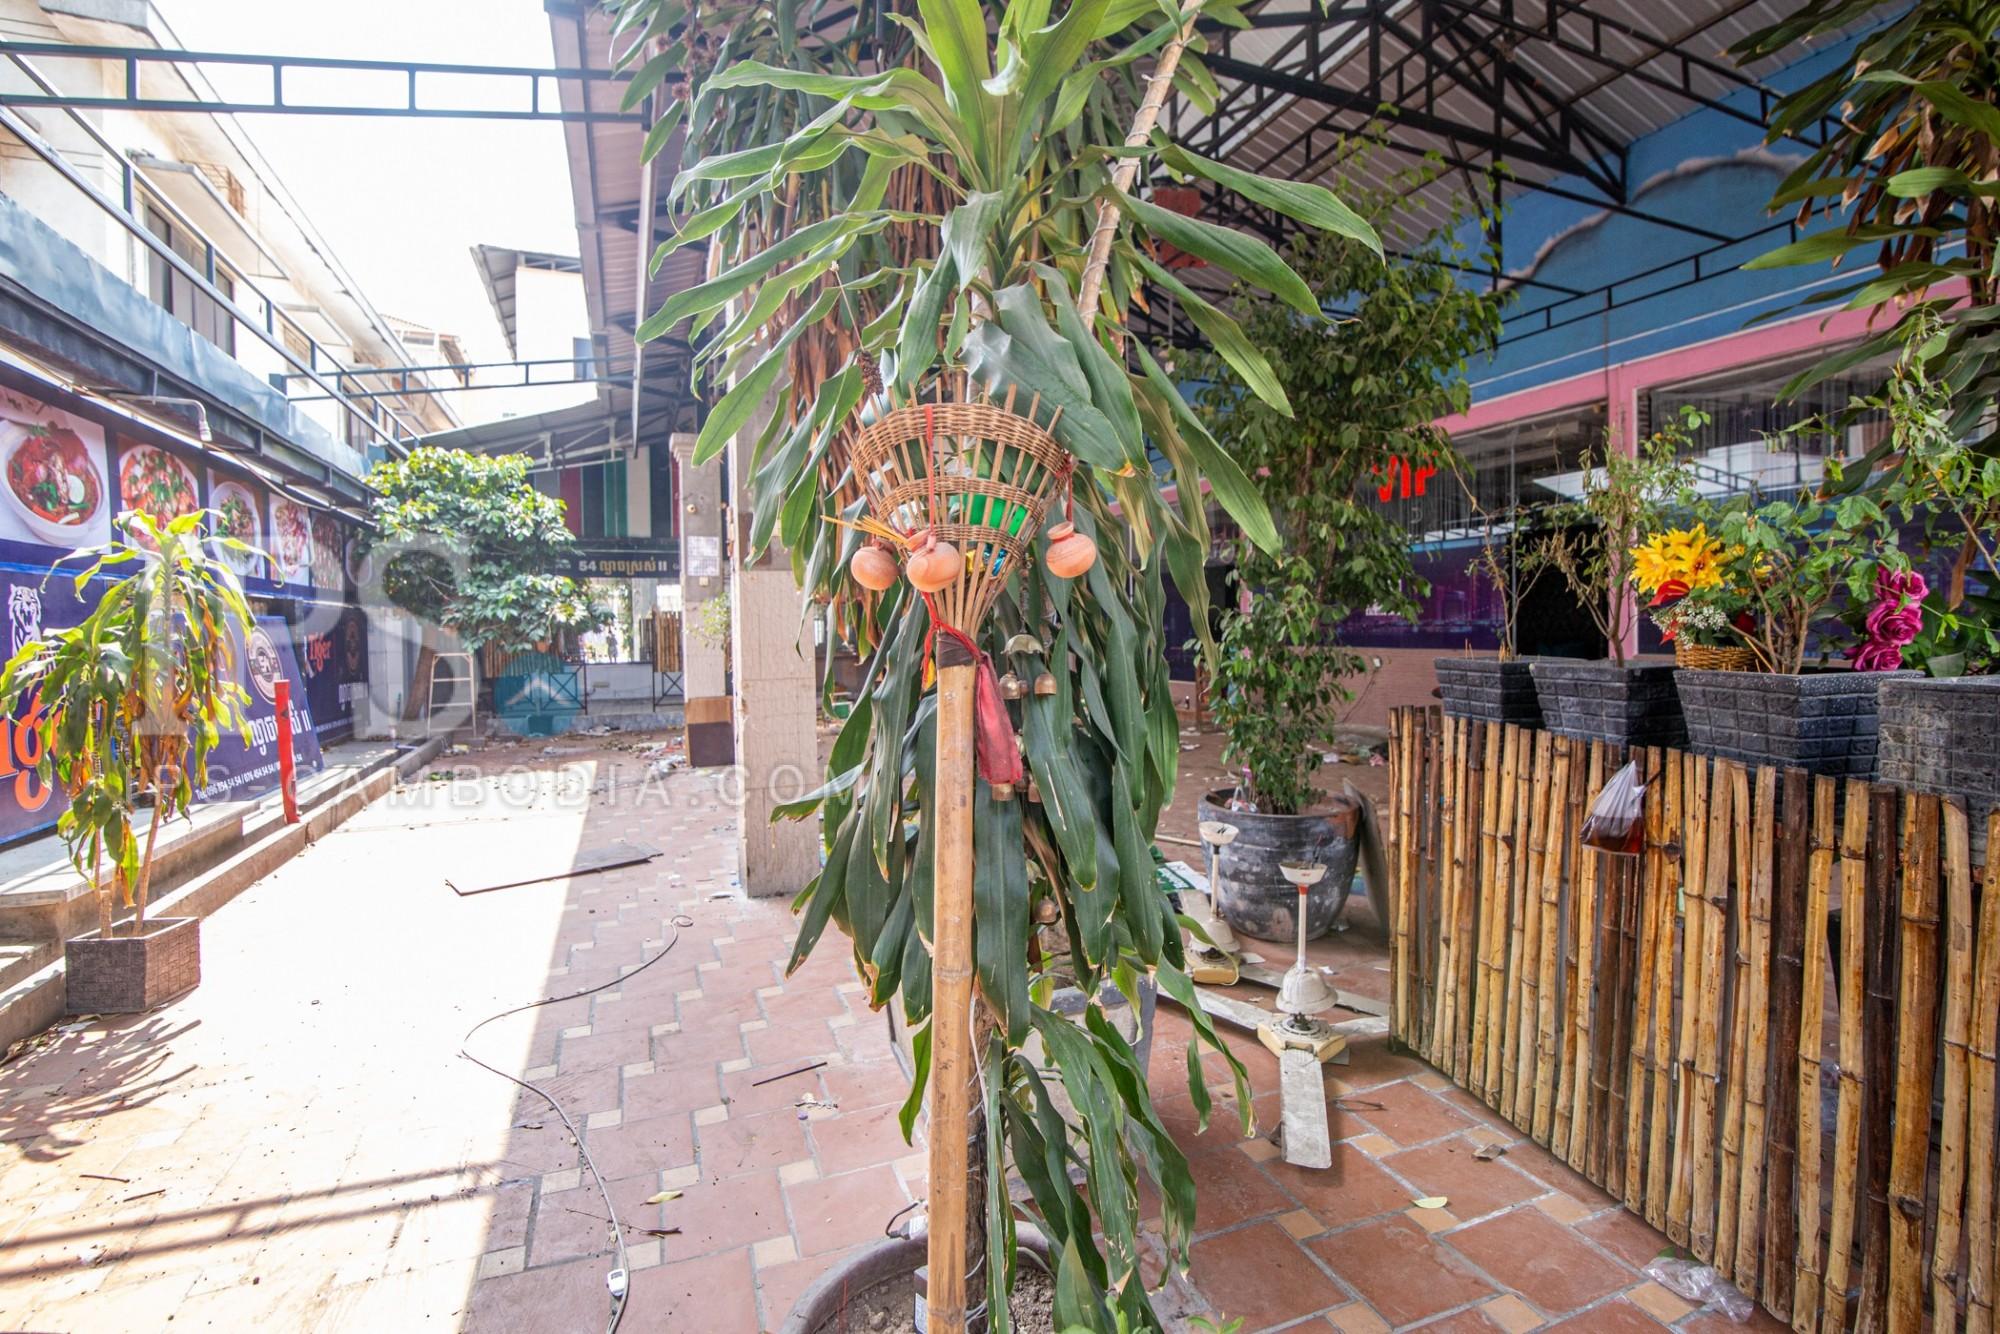 500 Sqm Commercial Space For Rent - BKK1, Chamkarmorn, Phnom Penh